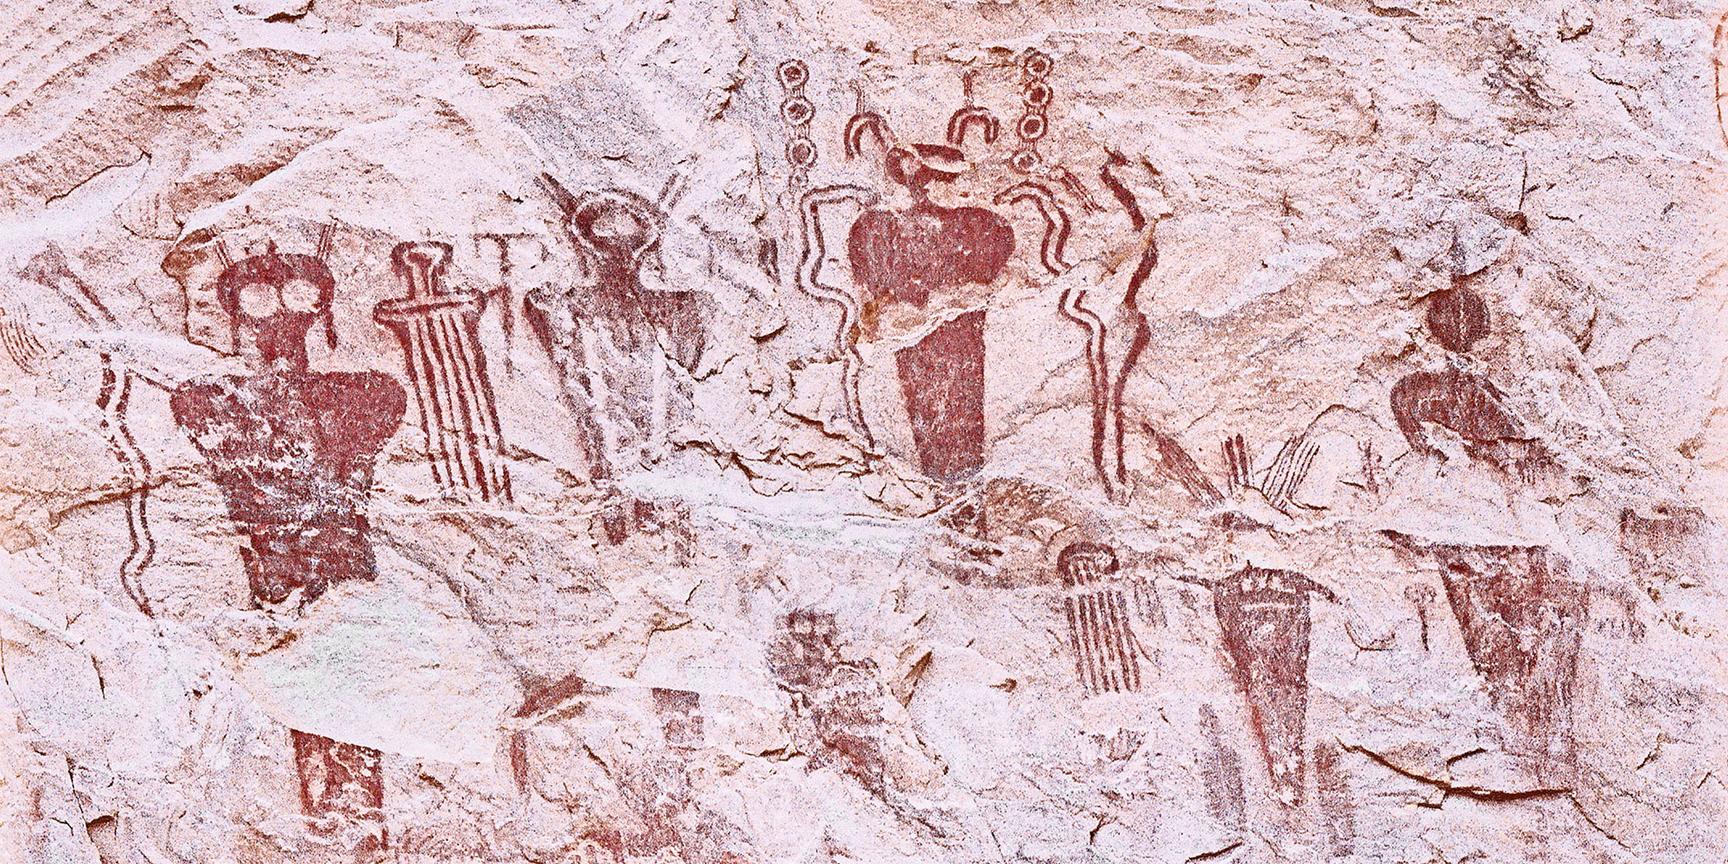 petroglyph_2_2x1.jpg